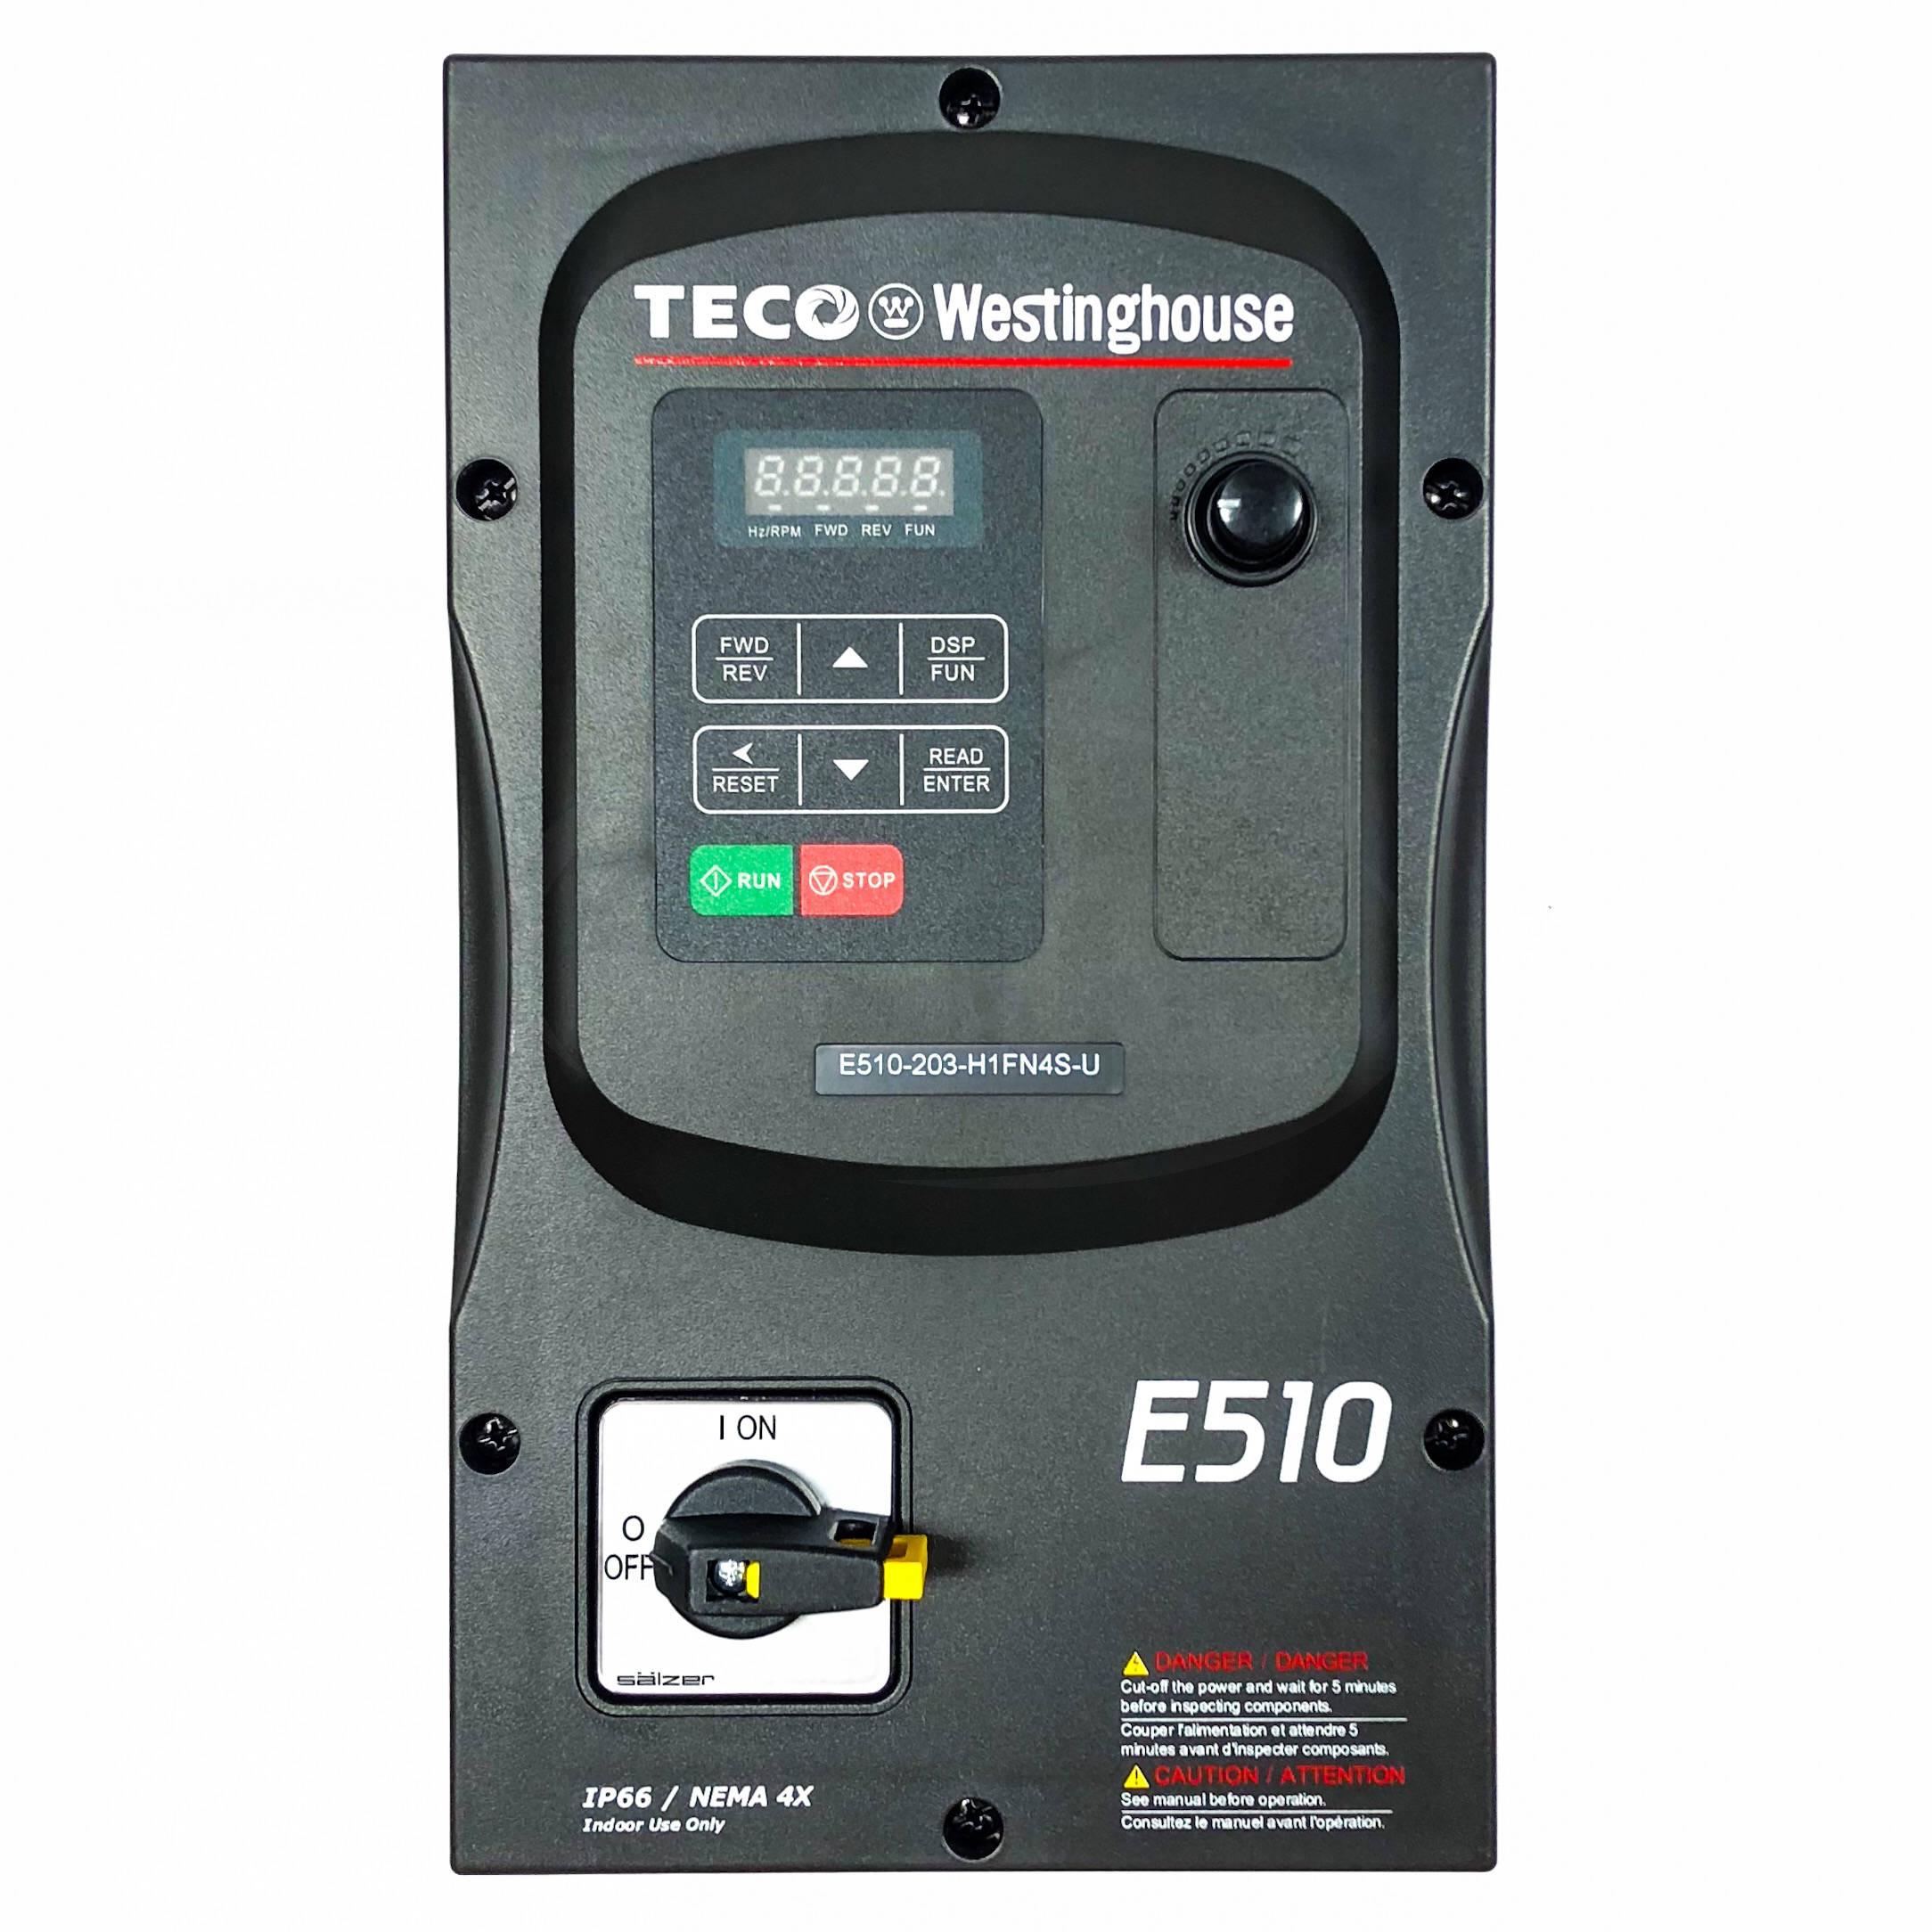 Teco Westinghouse E510